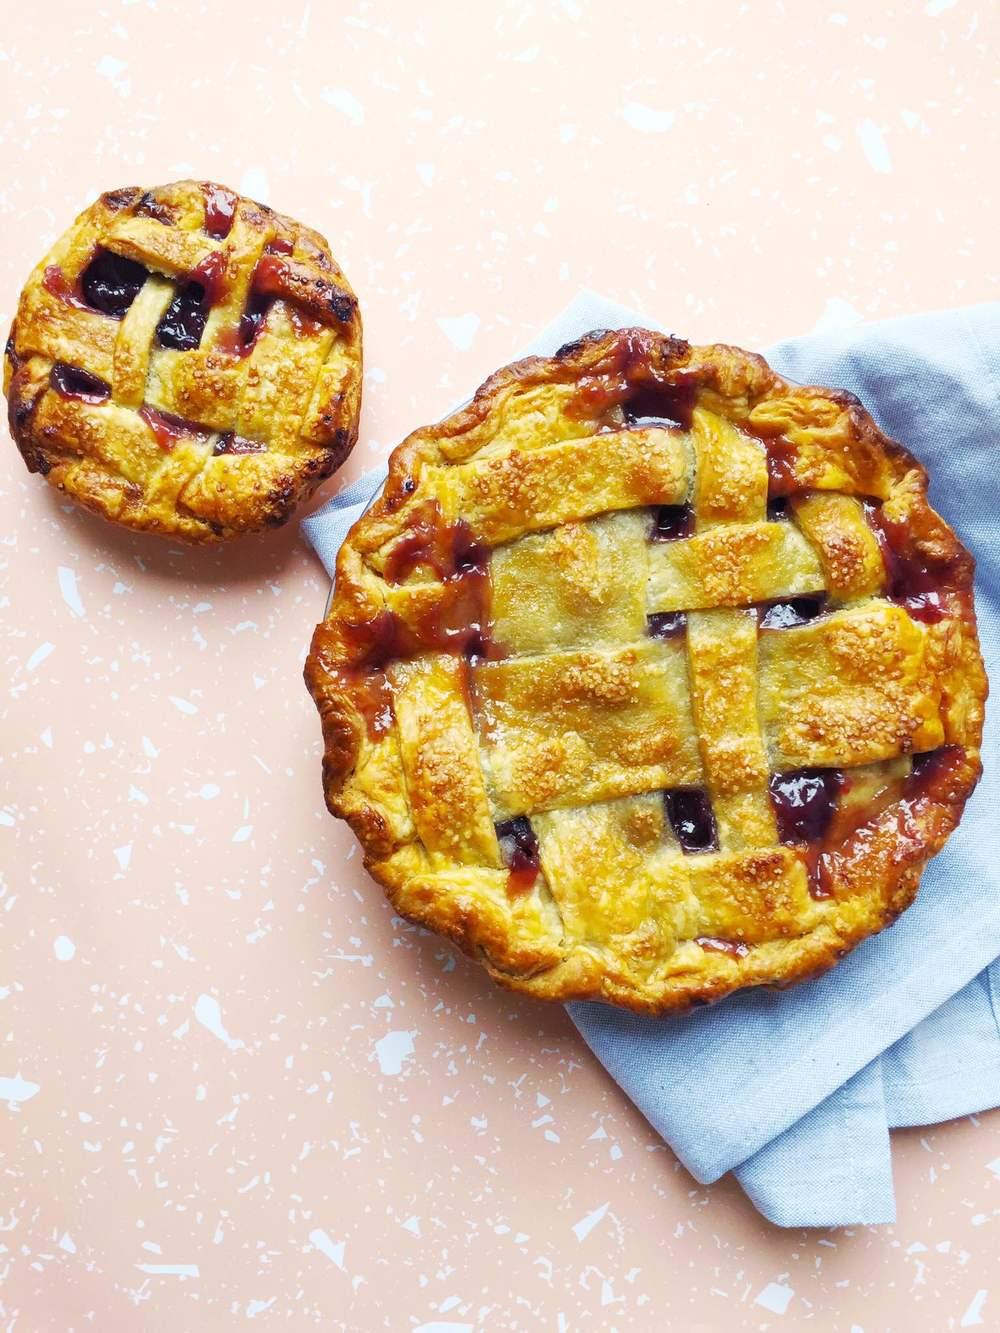 The Best Cherry Pie in London